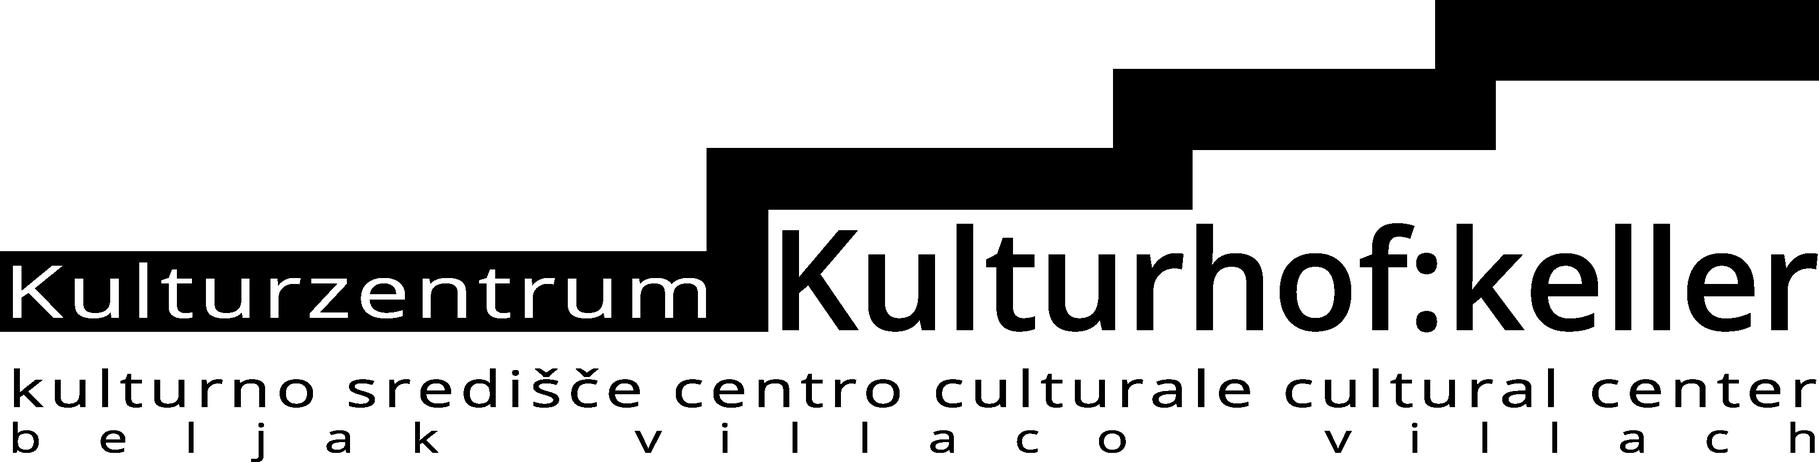 Kulturhof:keller 2014